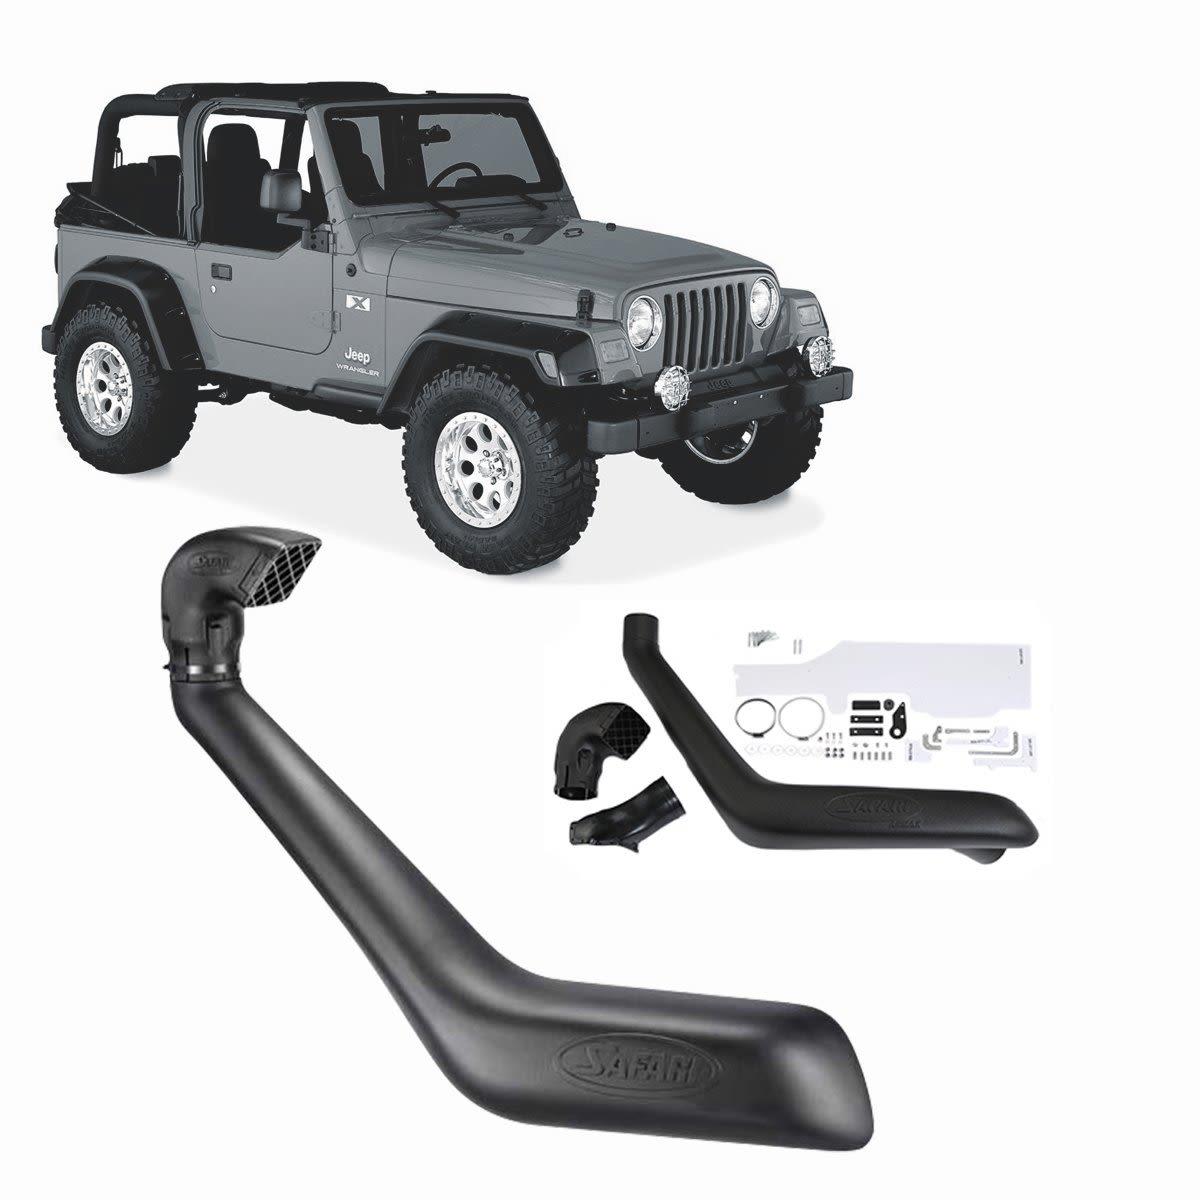 Safari Snorkel to suit Jeep Wrangler (10/1992 - 10/1999)